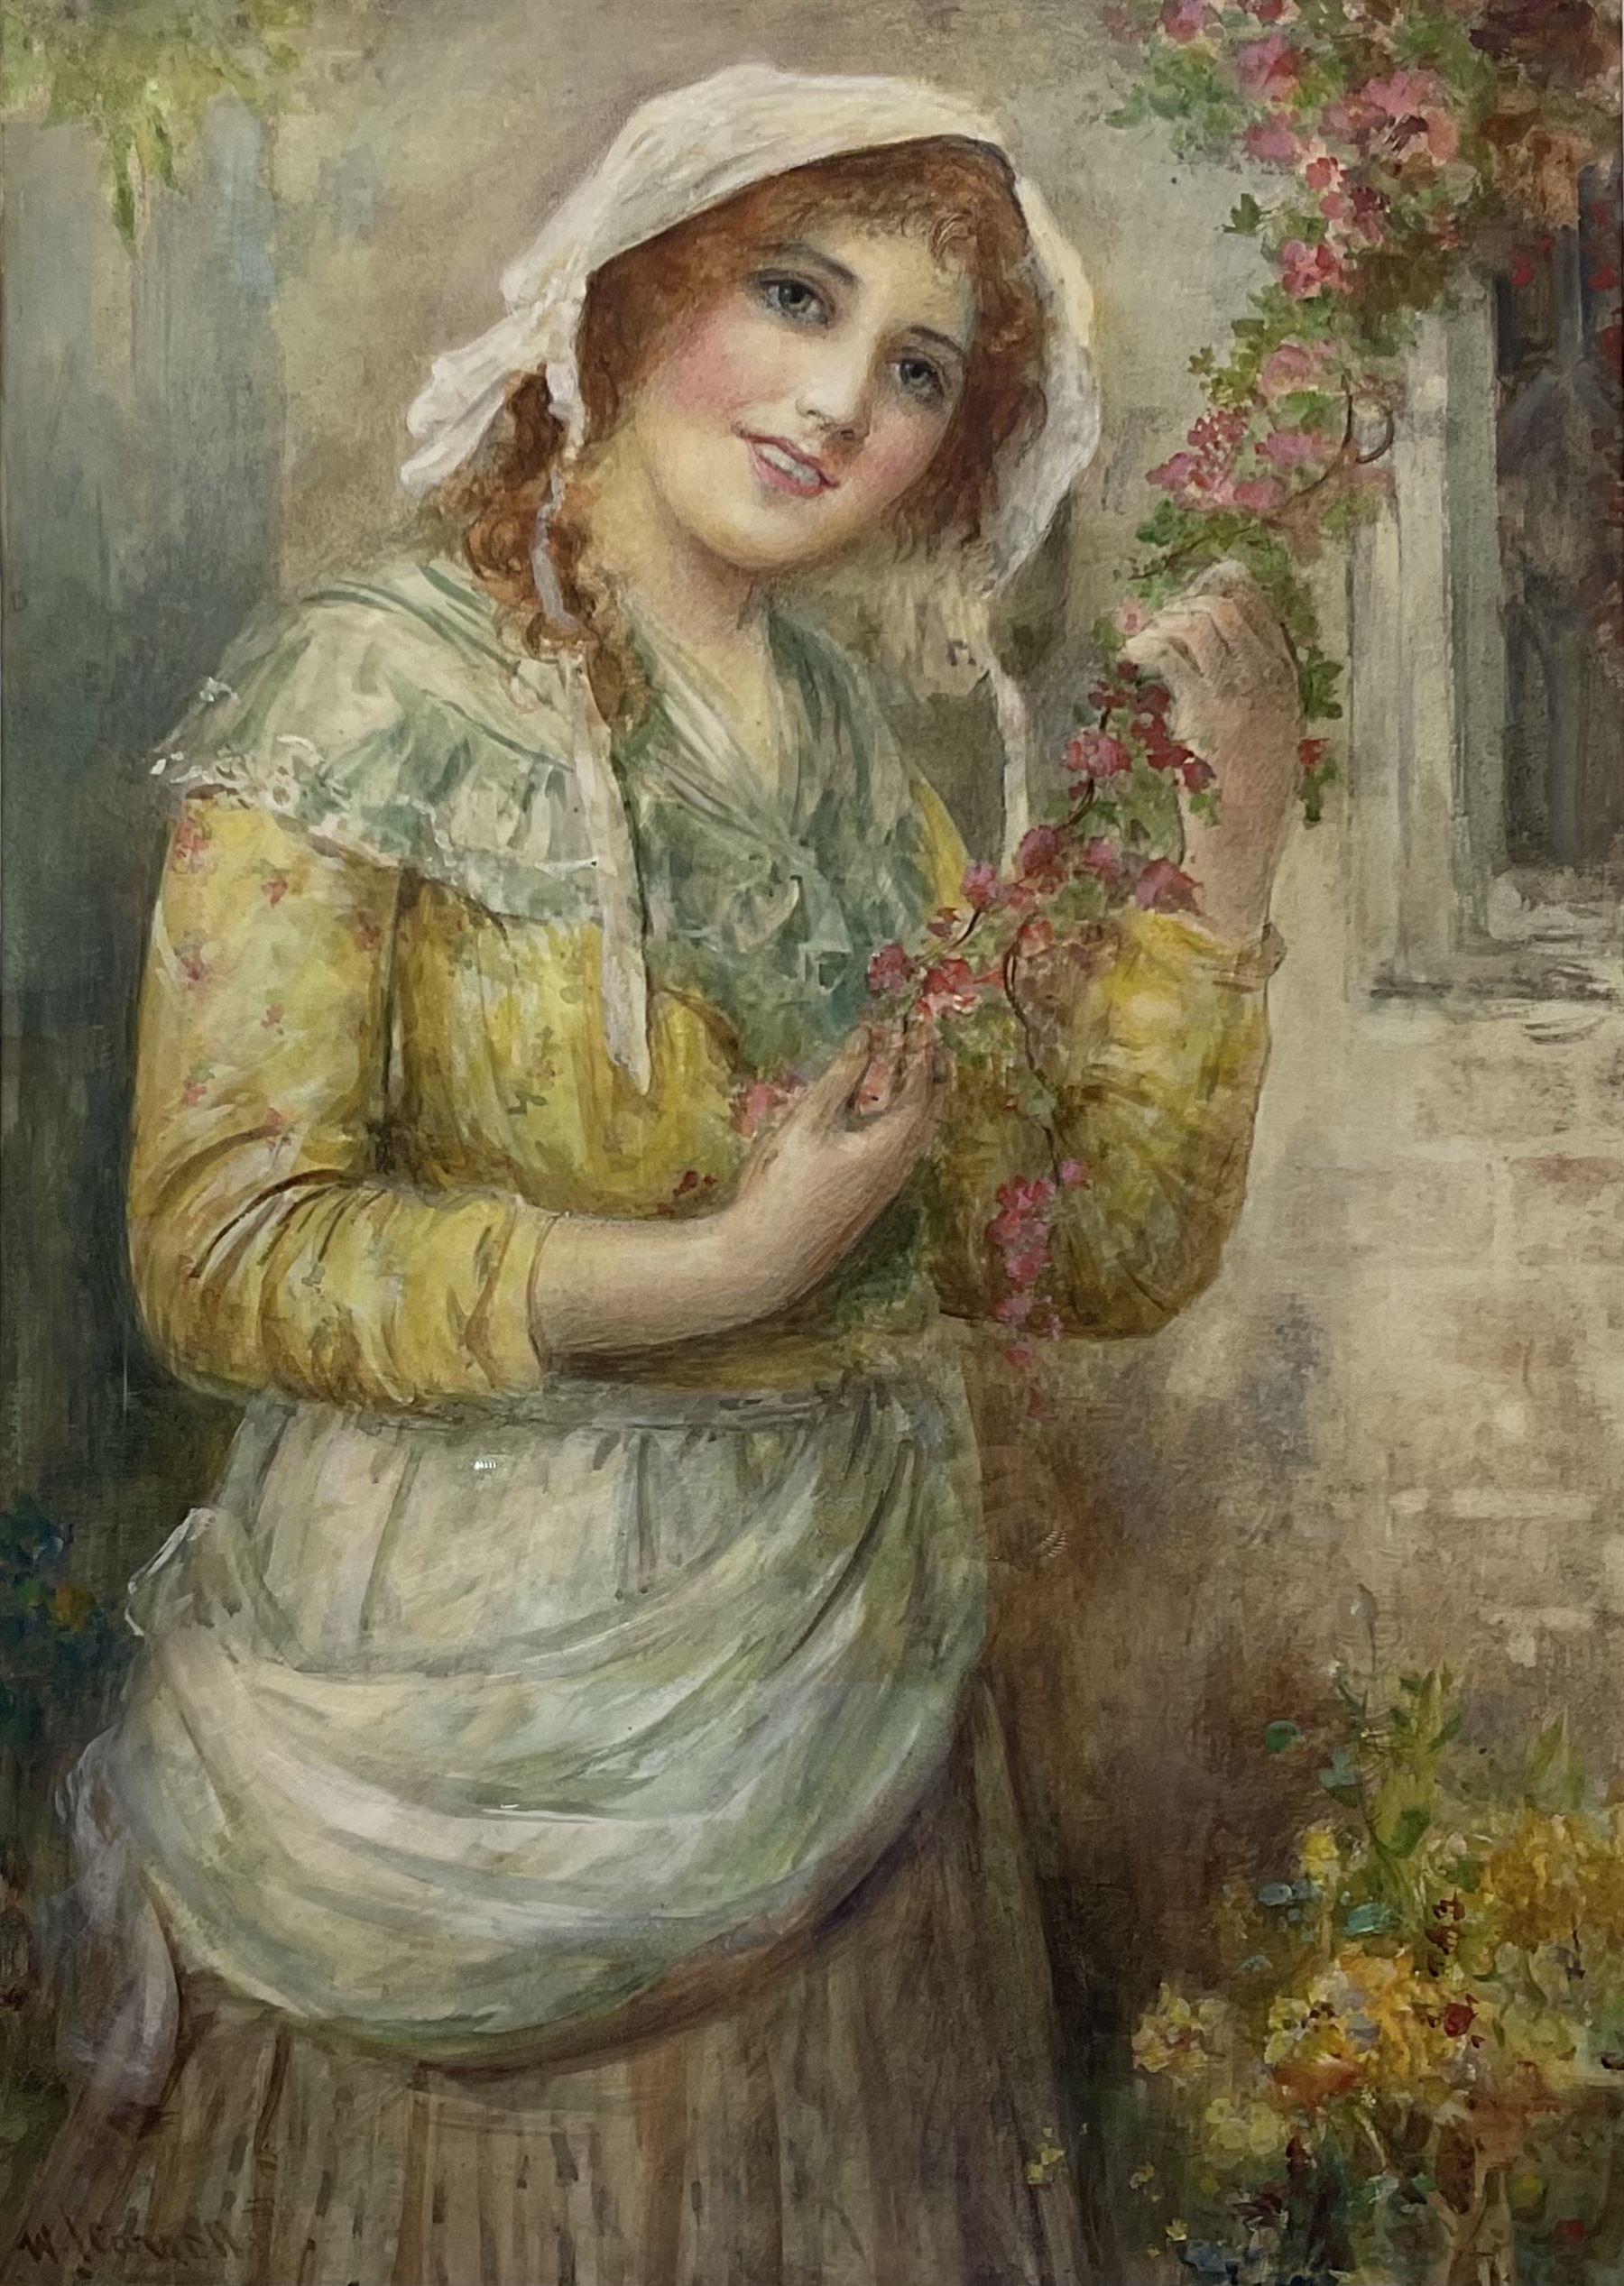 William Joseph Carroll (19th/20th Century): Country Girl Holding Blossom